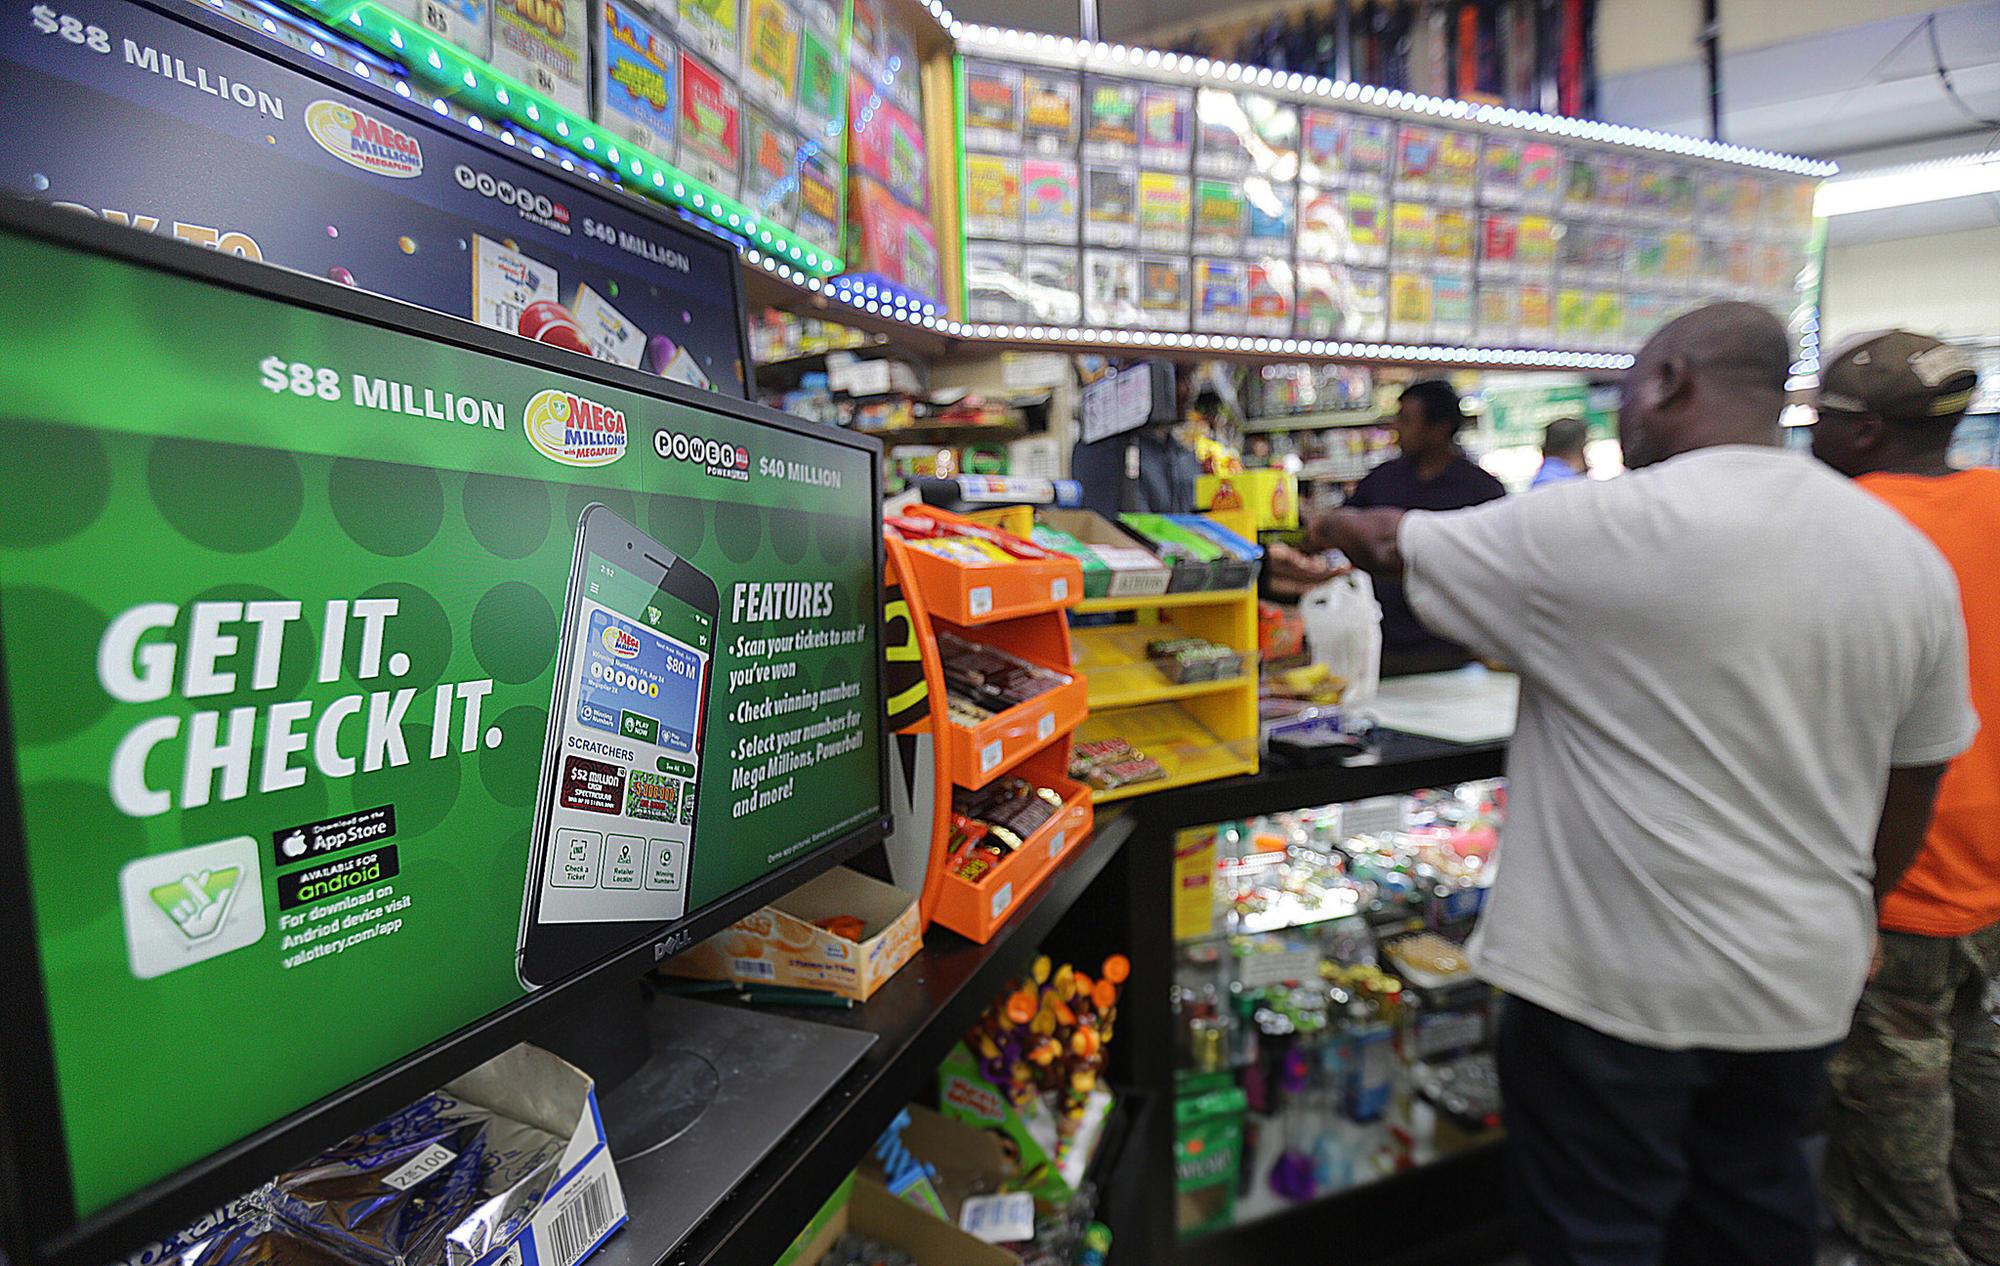 Lottery sales up across Peninsula - Daily Press